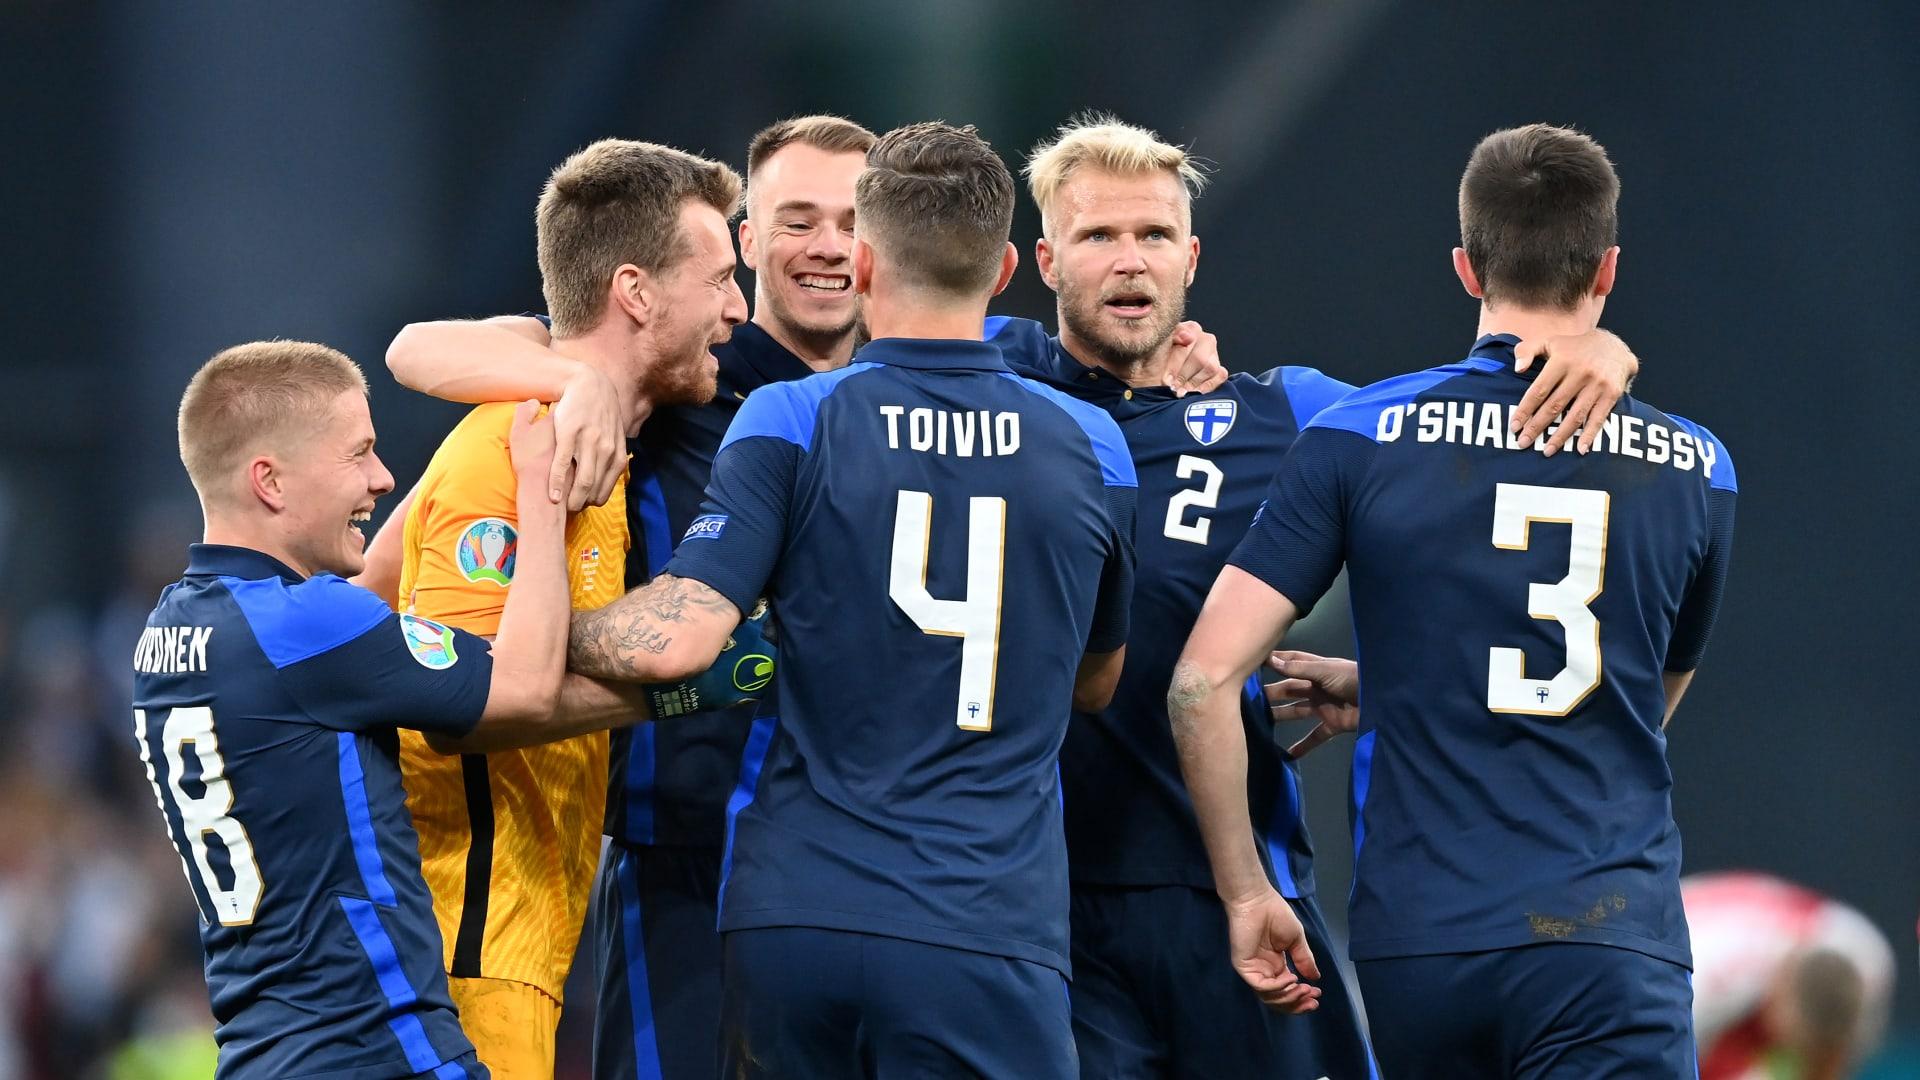 يورو 2020: فنلندا تفوز على الدنمارك بهدف نظيف بعد حادث درامي